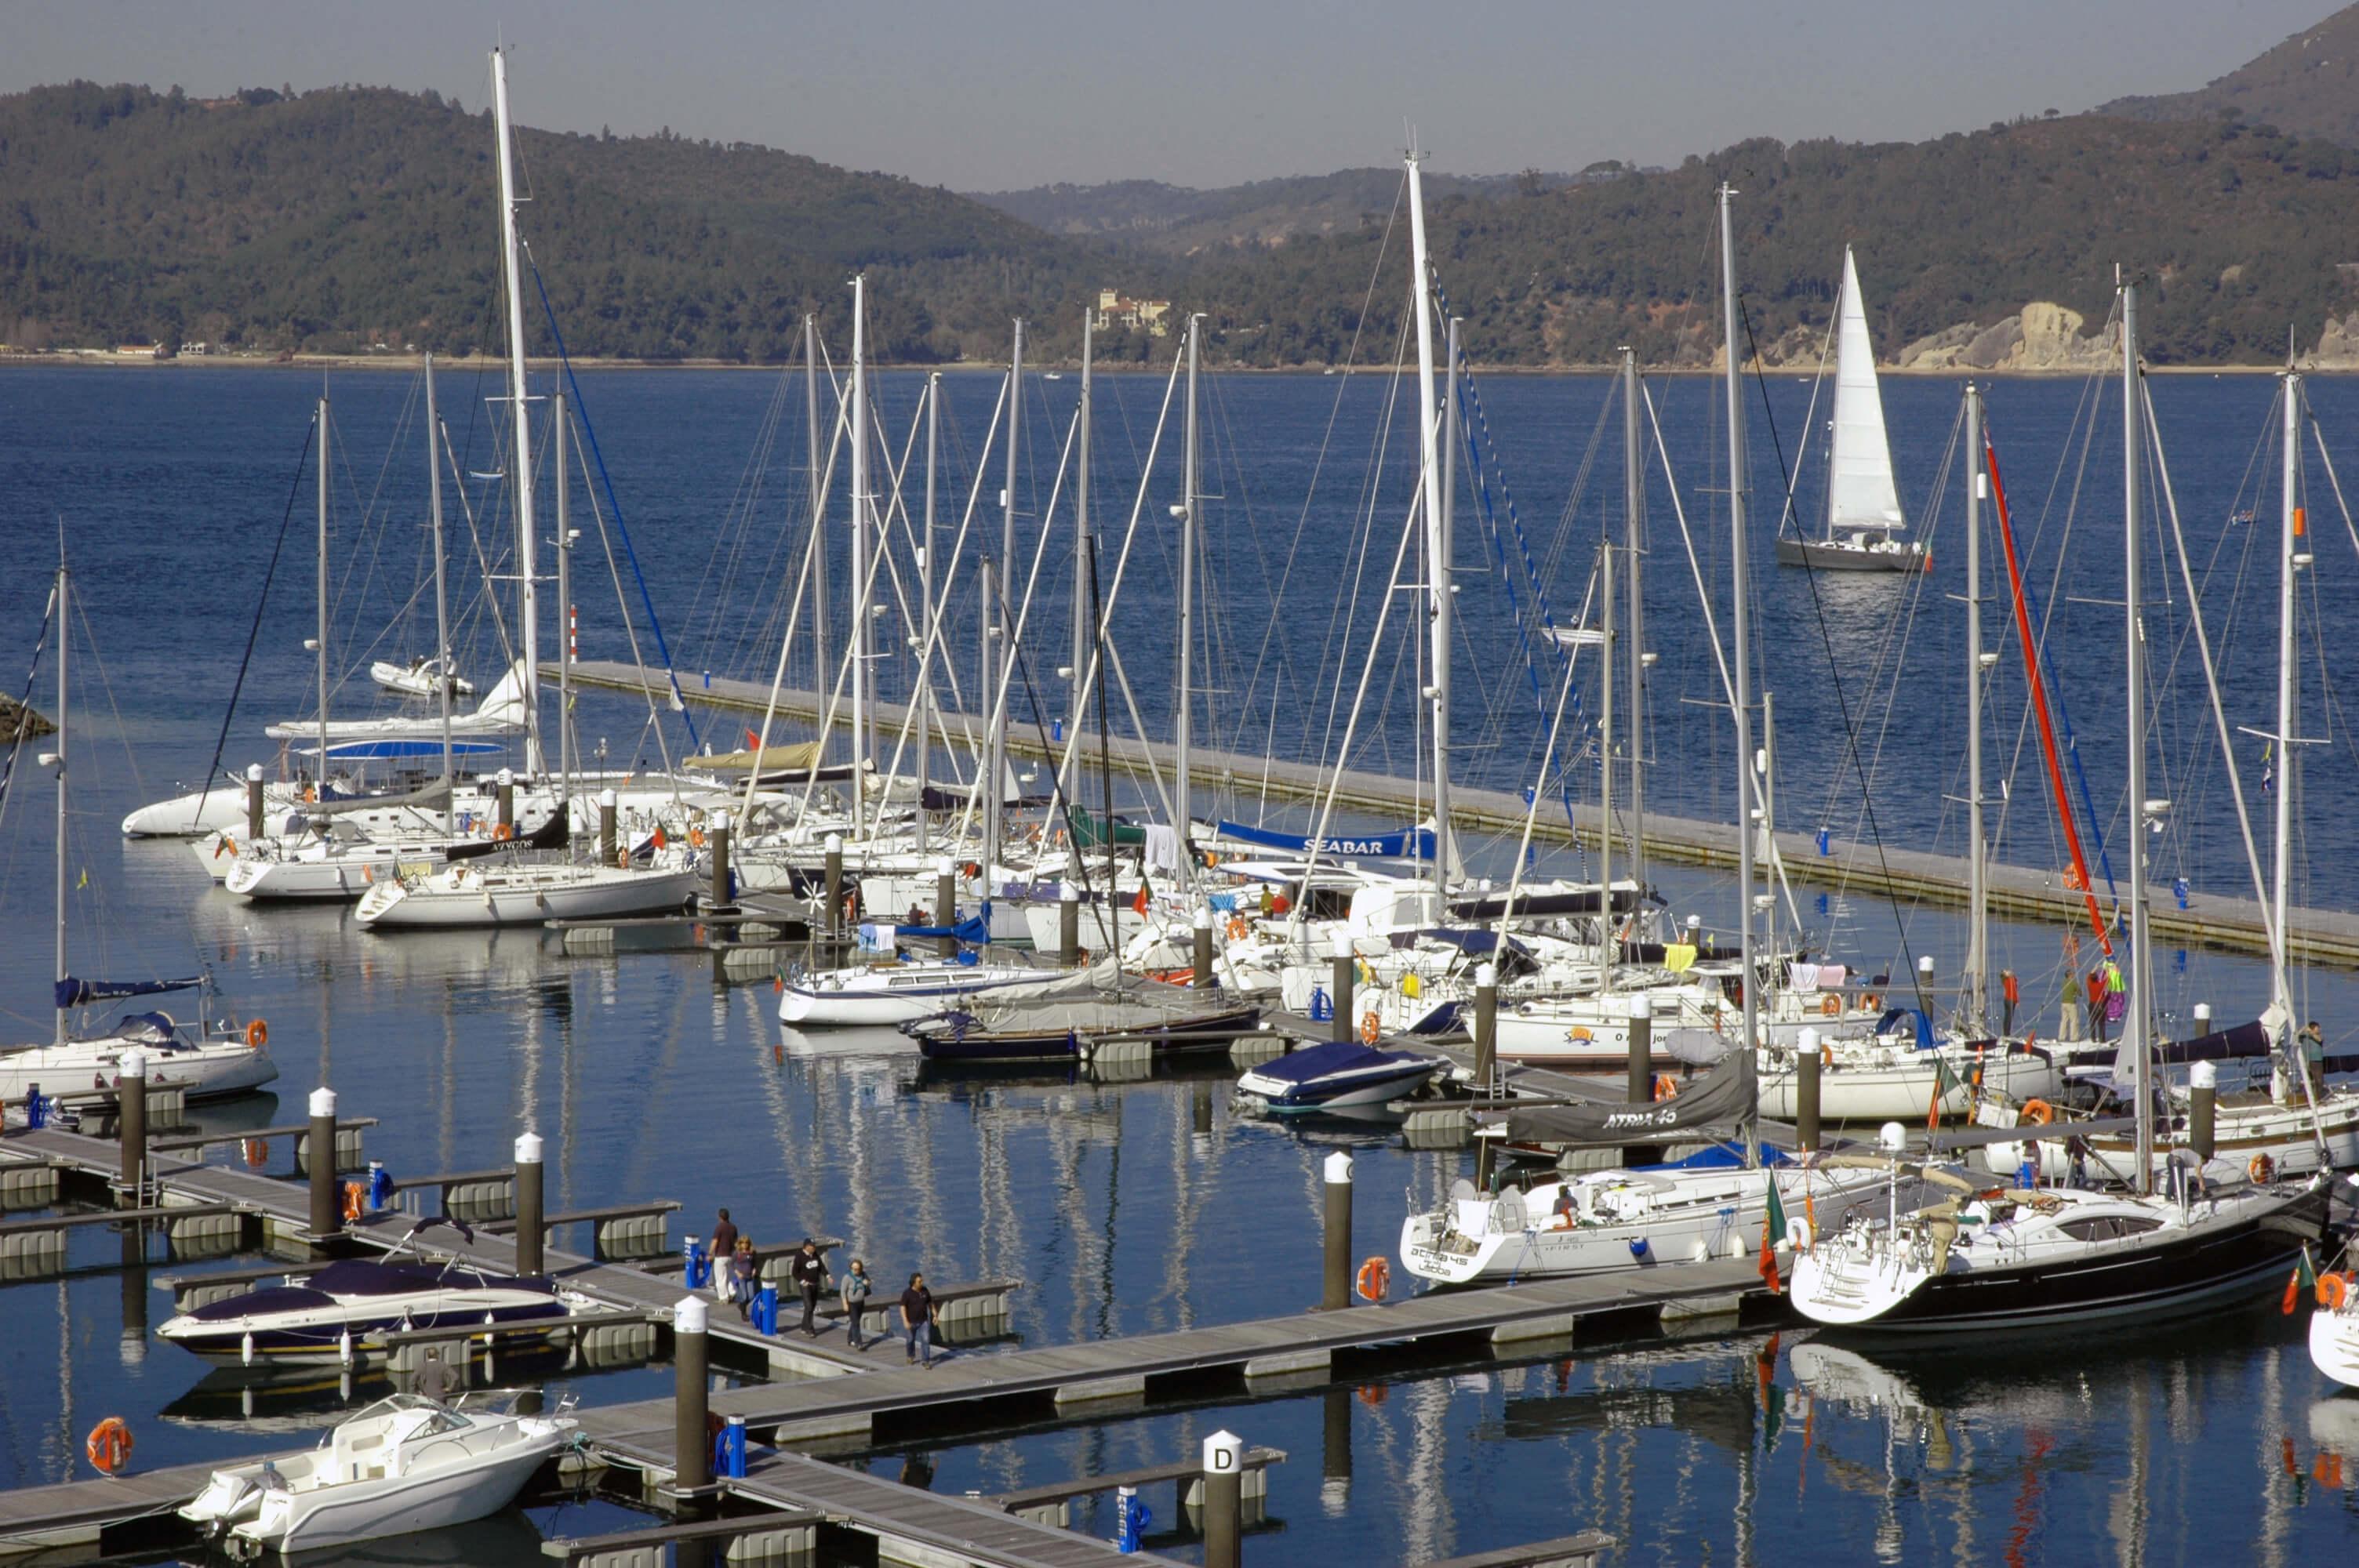 Troia Marina